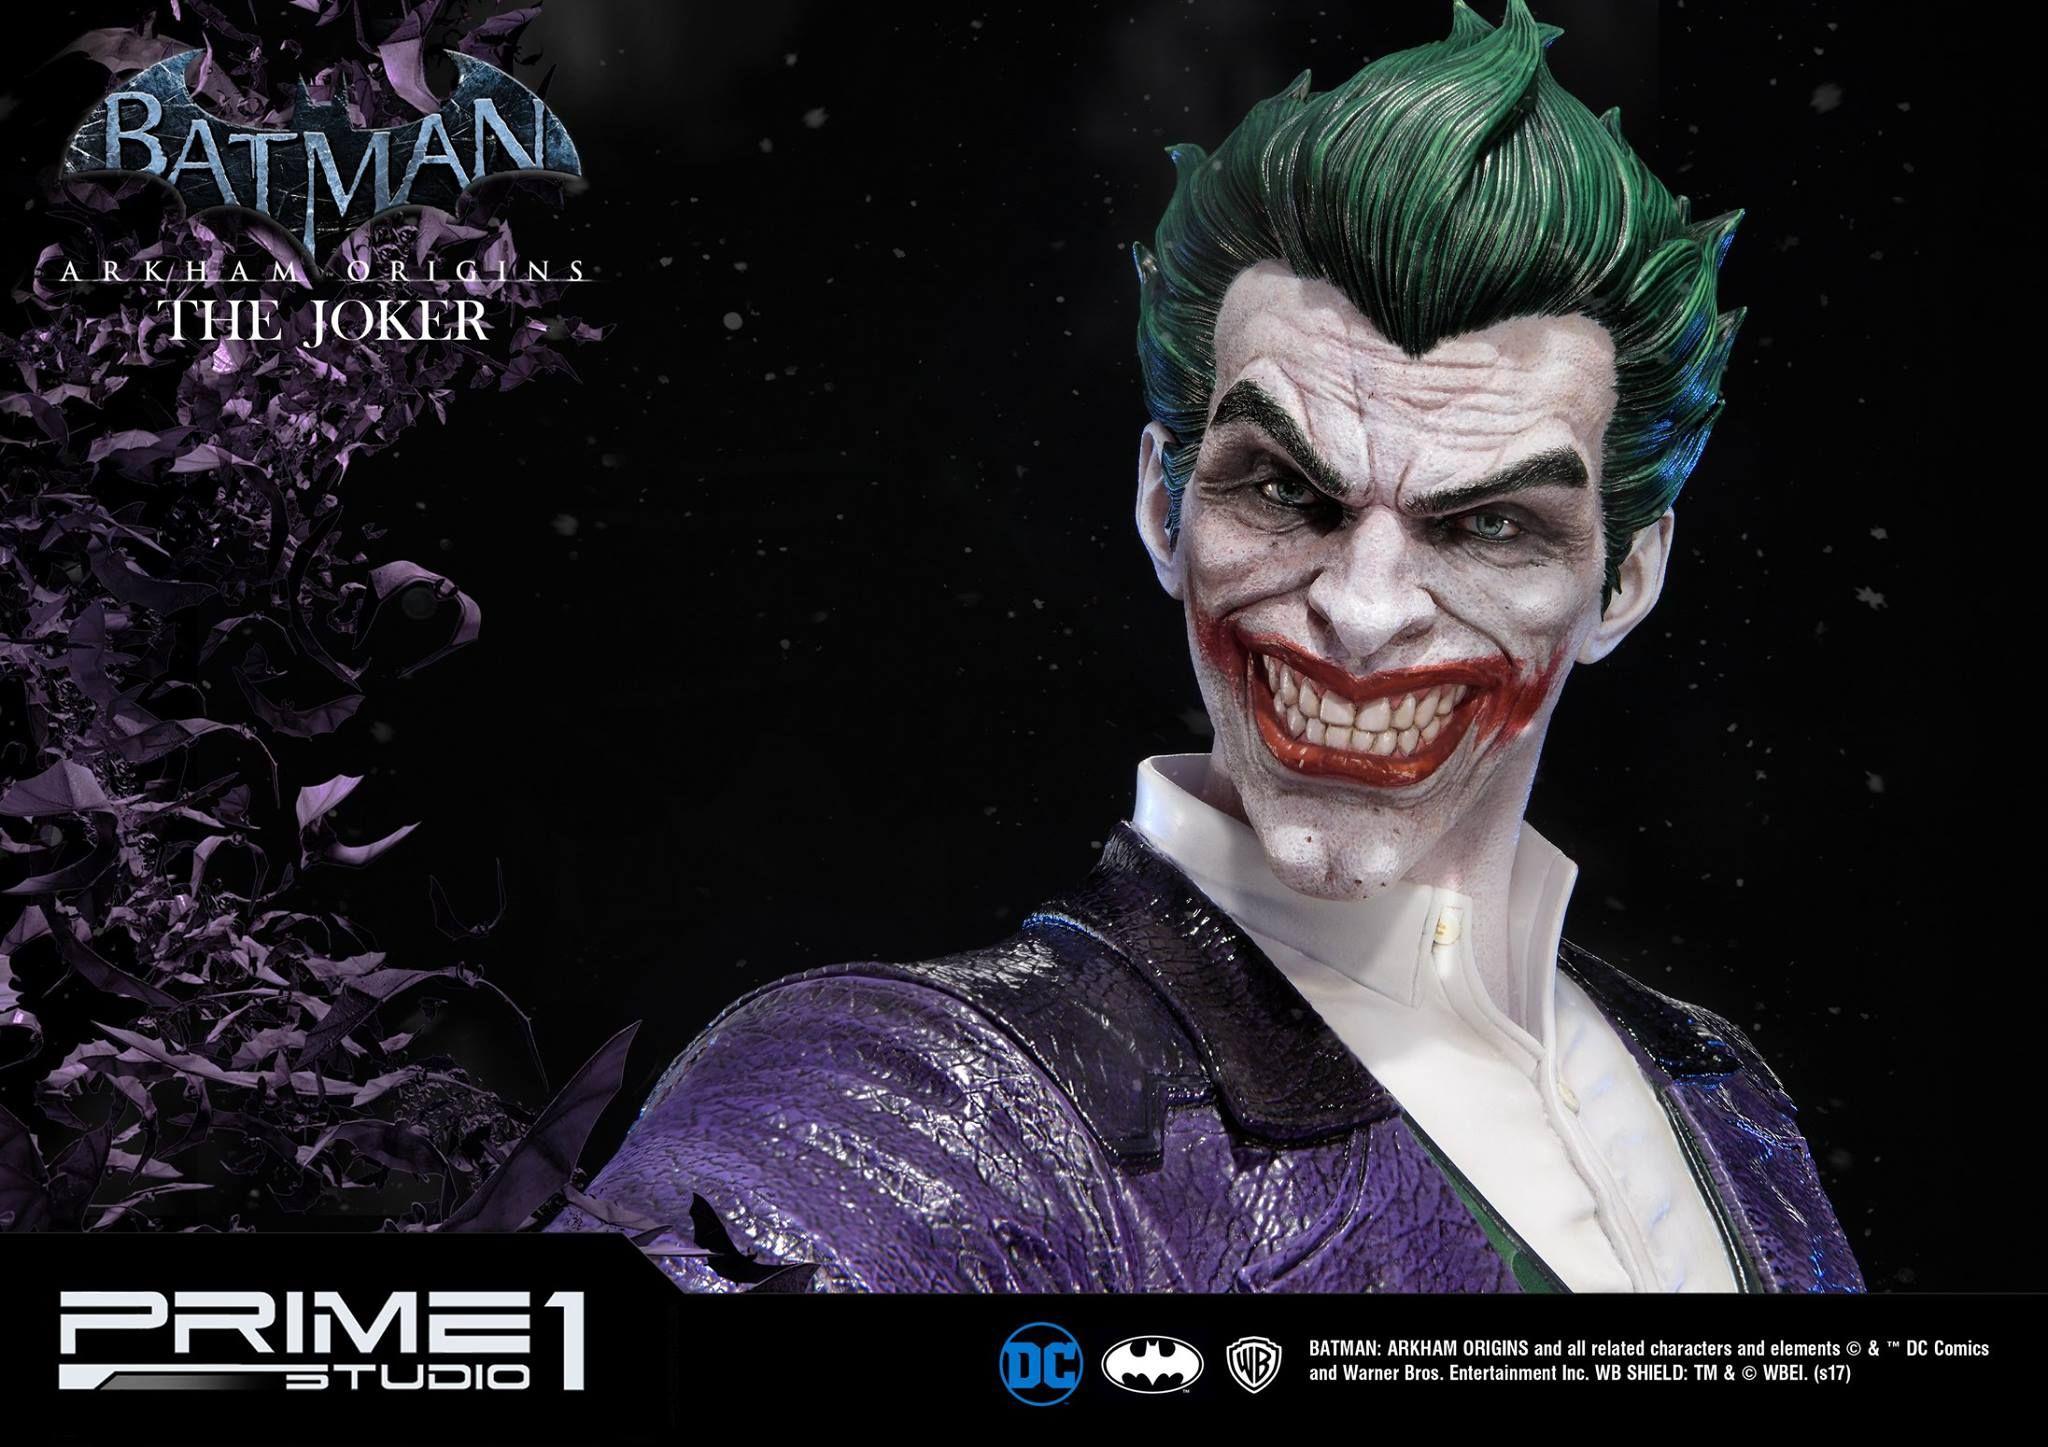 Prime 1 arkham origins joker statue 020g 20481447 batman prime 1 arkham origins joker statue 020g voltagebd Gallery